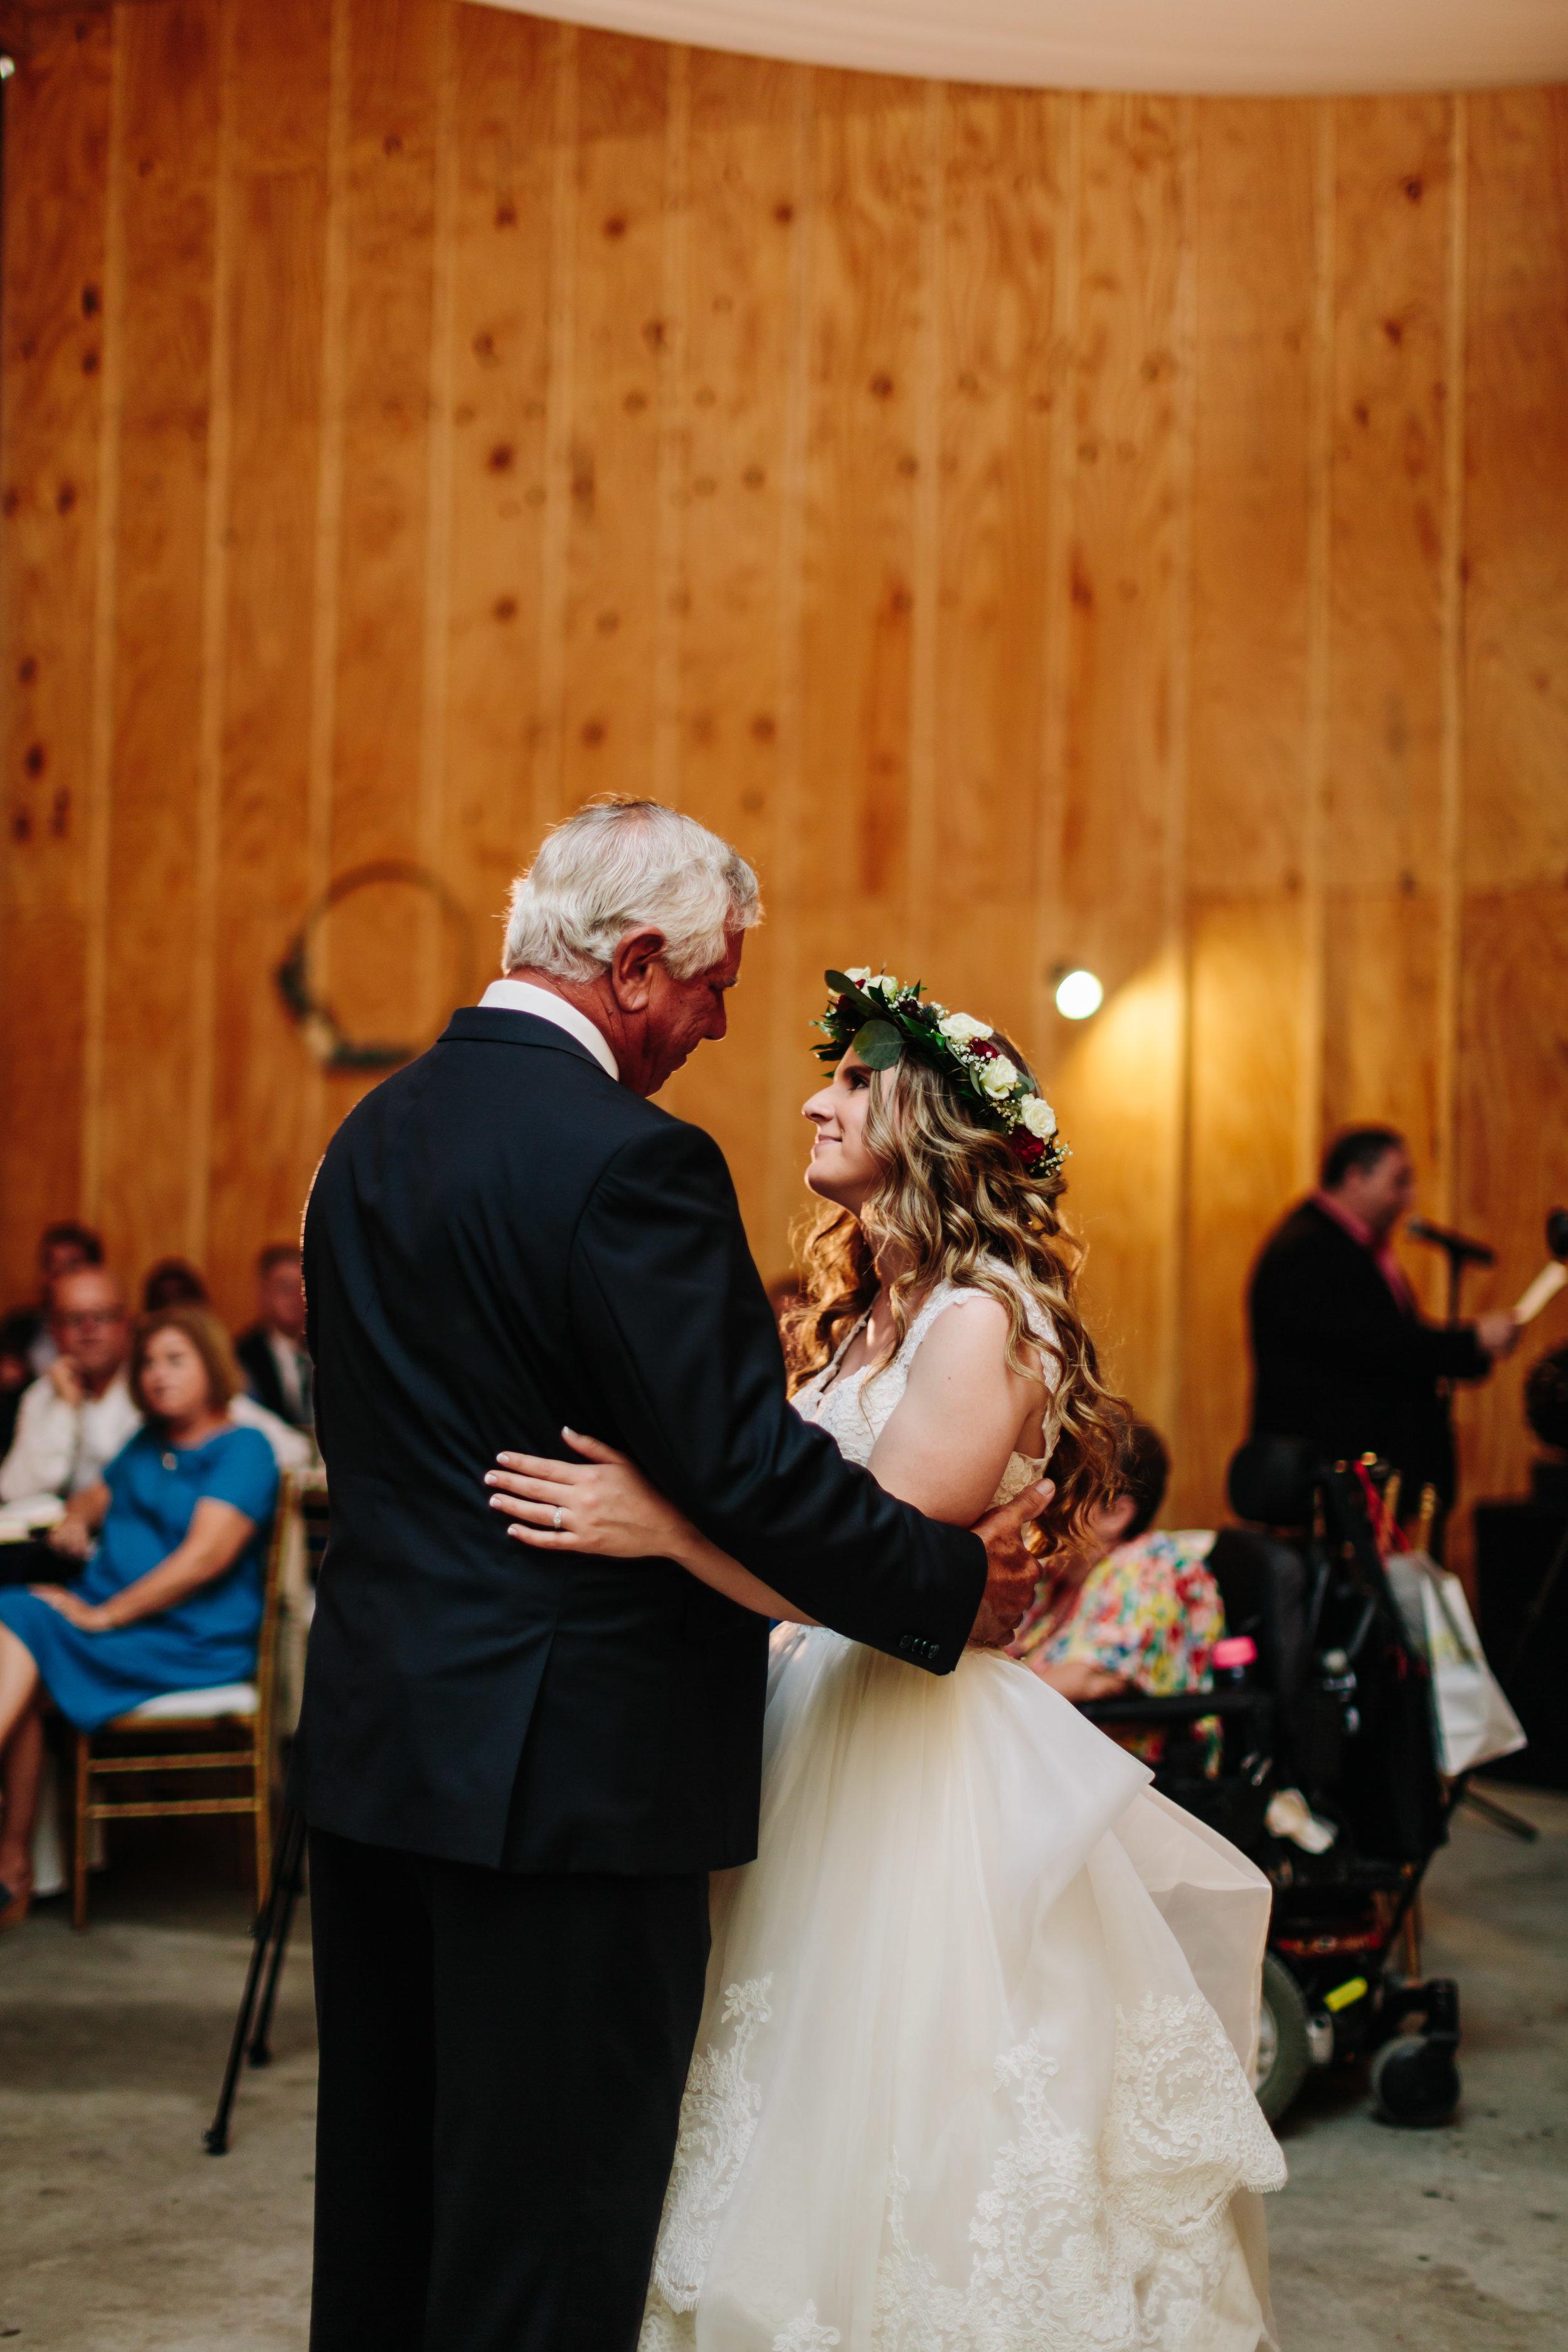 2018.04.14 Zak and Jamisyn Unrue Black Willow Barn Wedding Finals-643.jpg